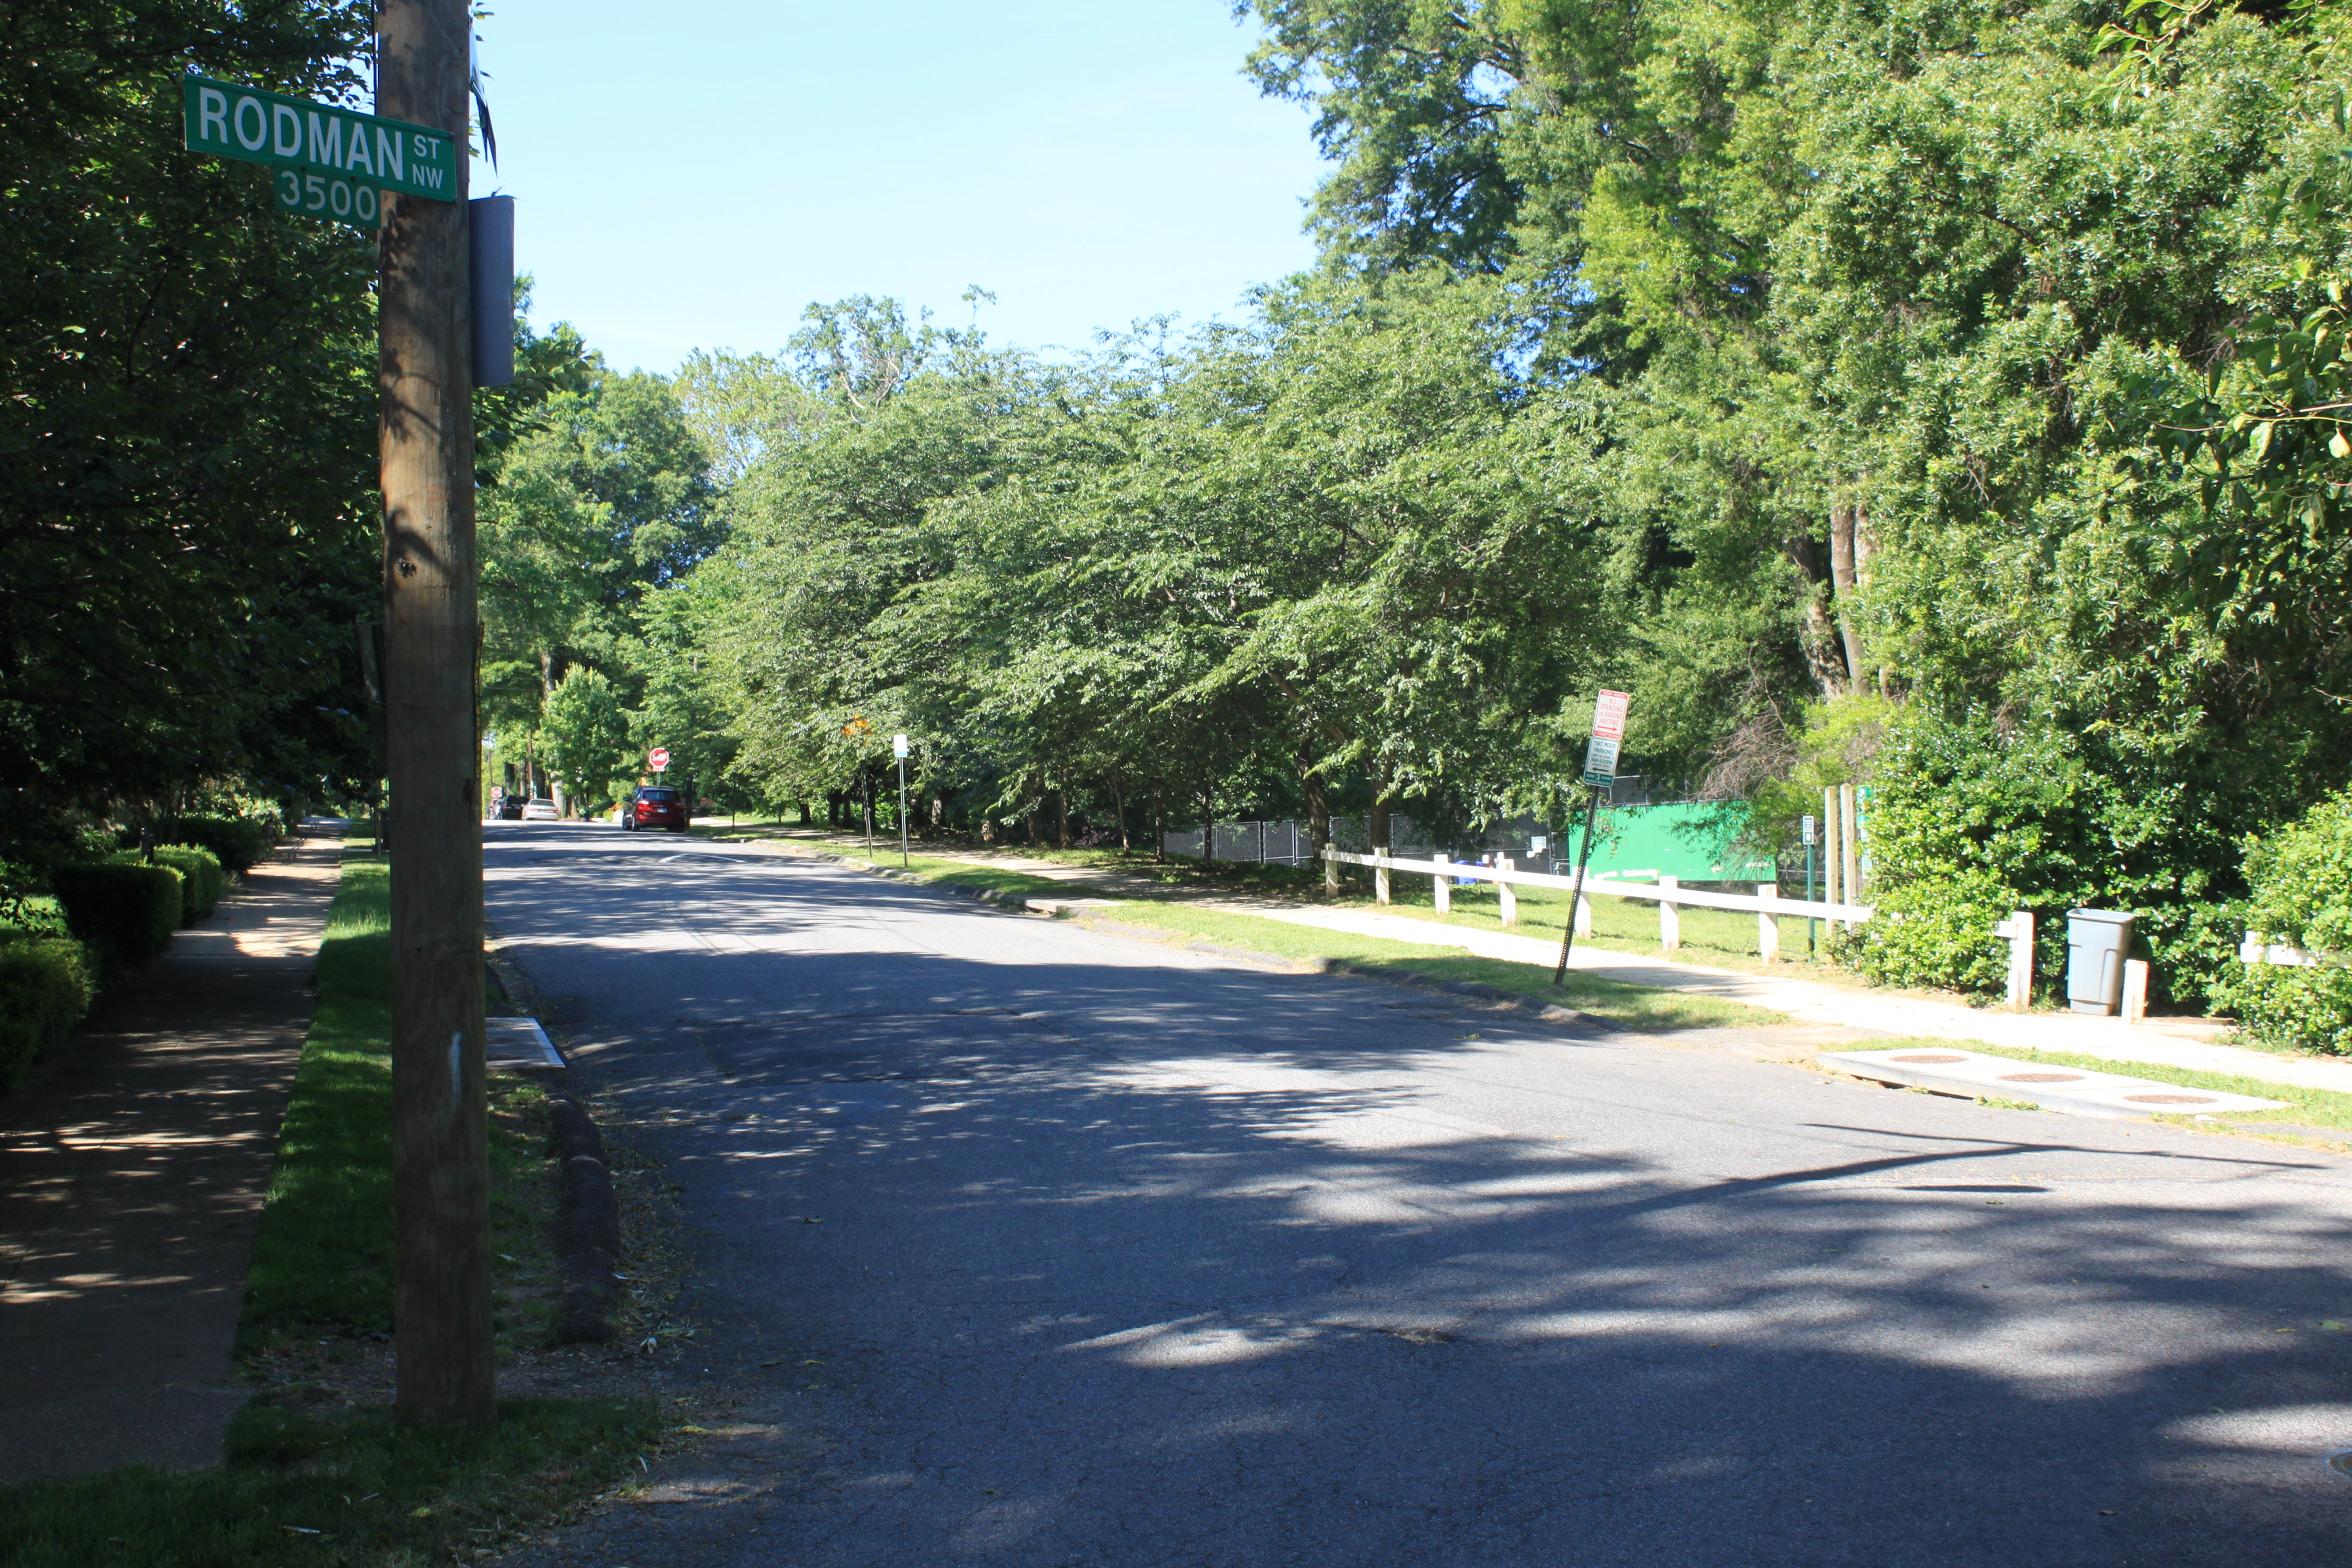 Idaho Avenue Looking Towards Quebec Street. (Idaho Avenue entrance is on the right.)